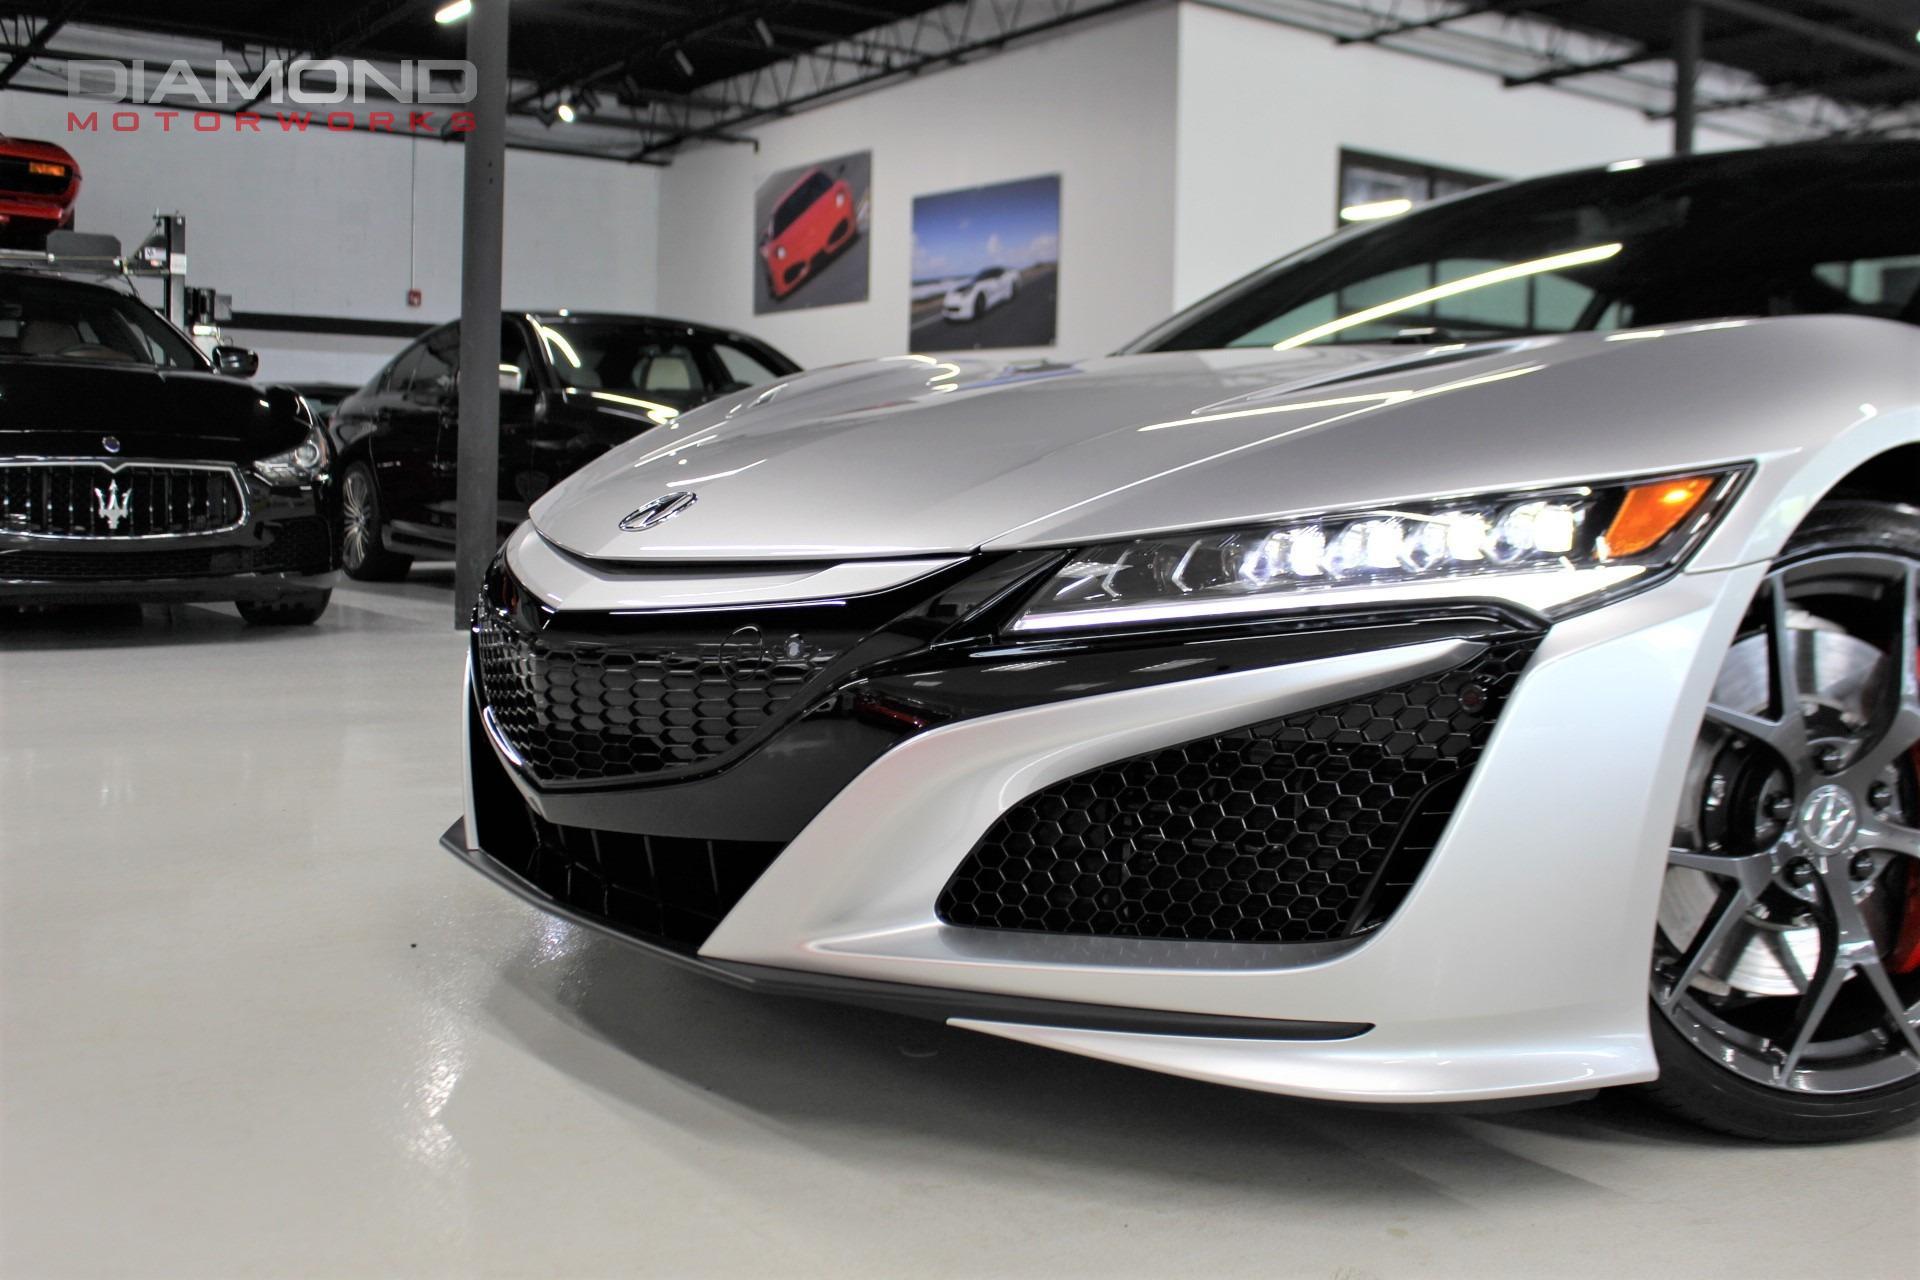 Used-2019-Acura-NSX-SH-AWD-Sport-Hybrid